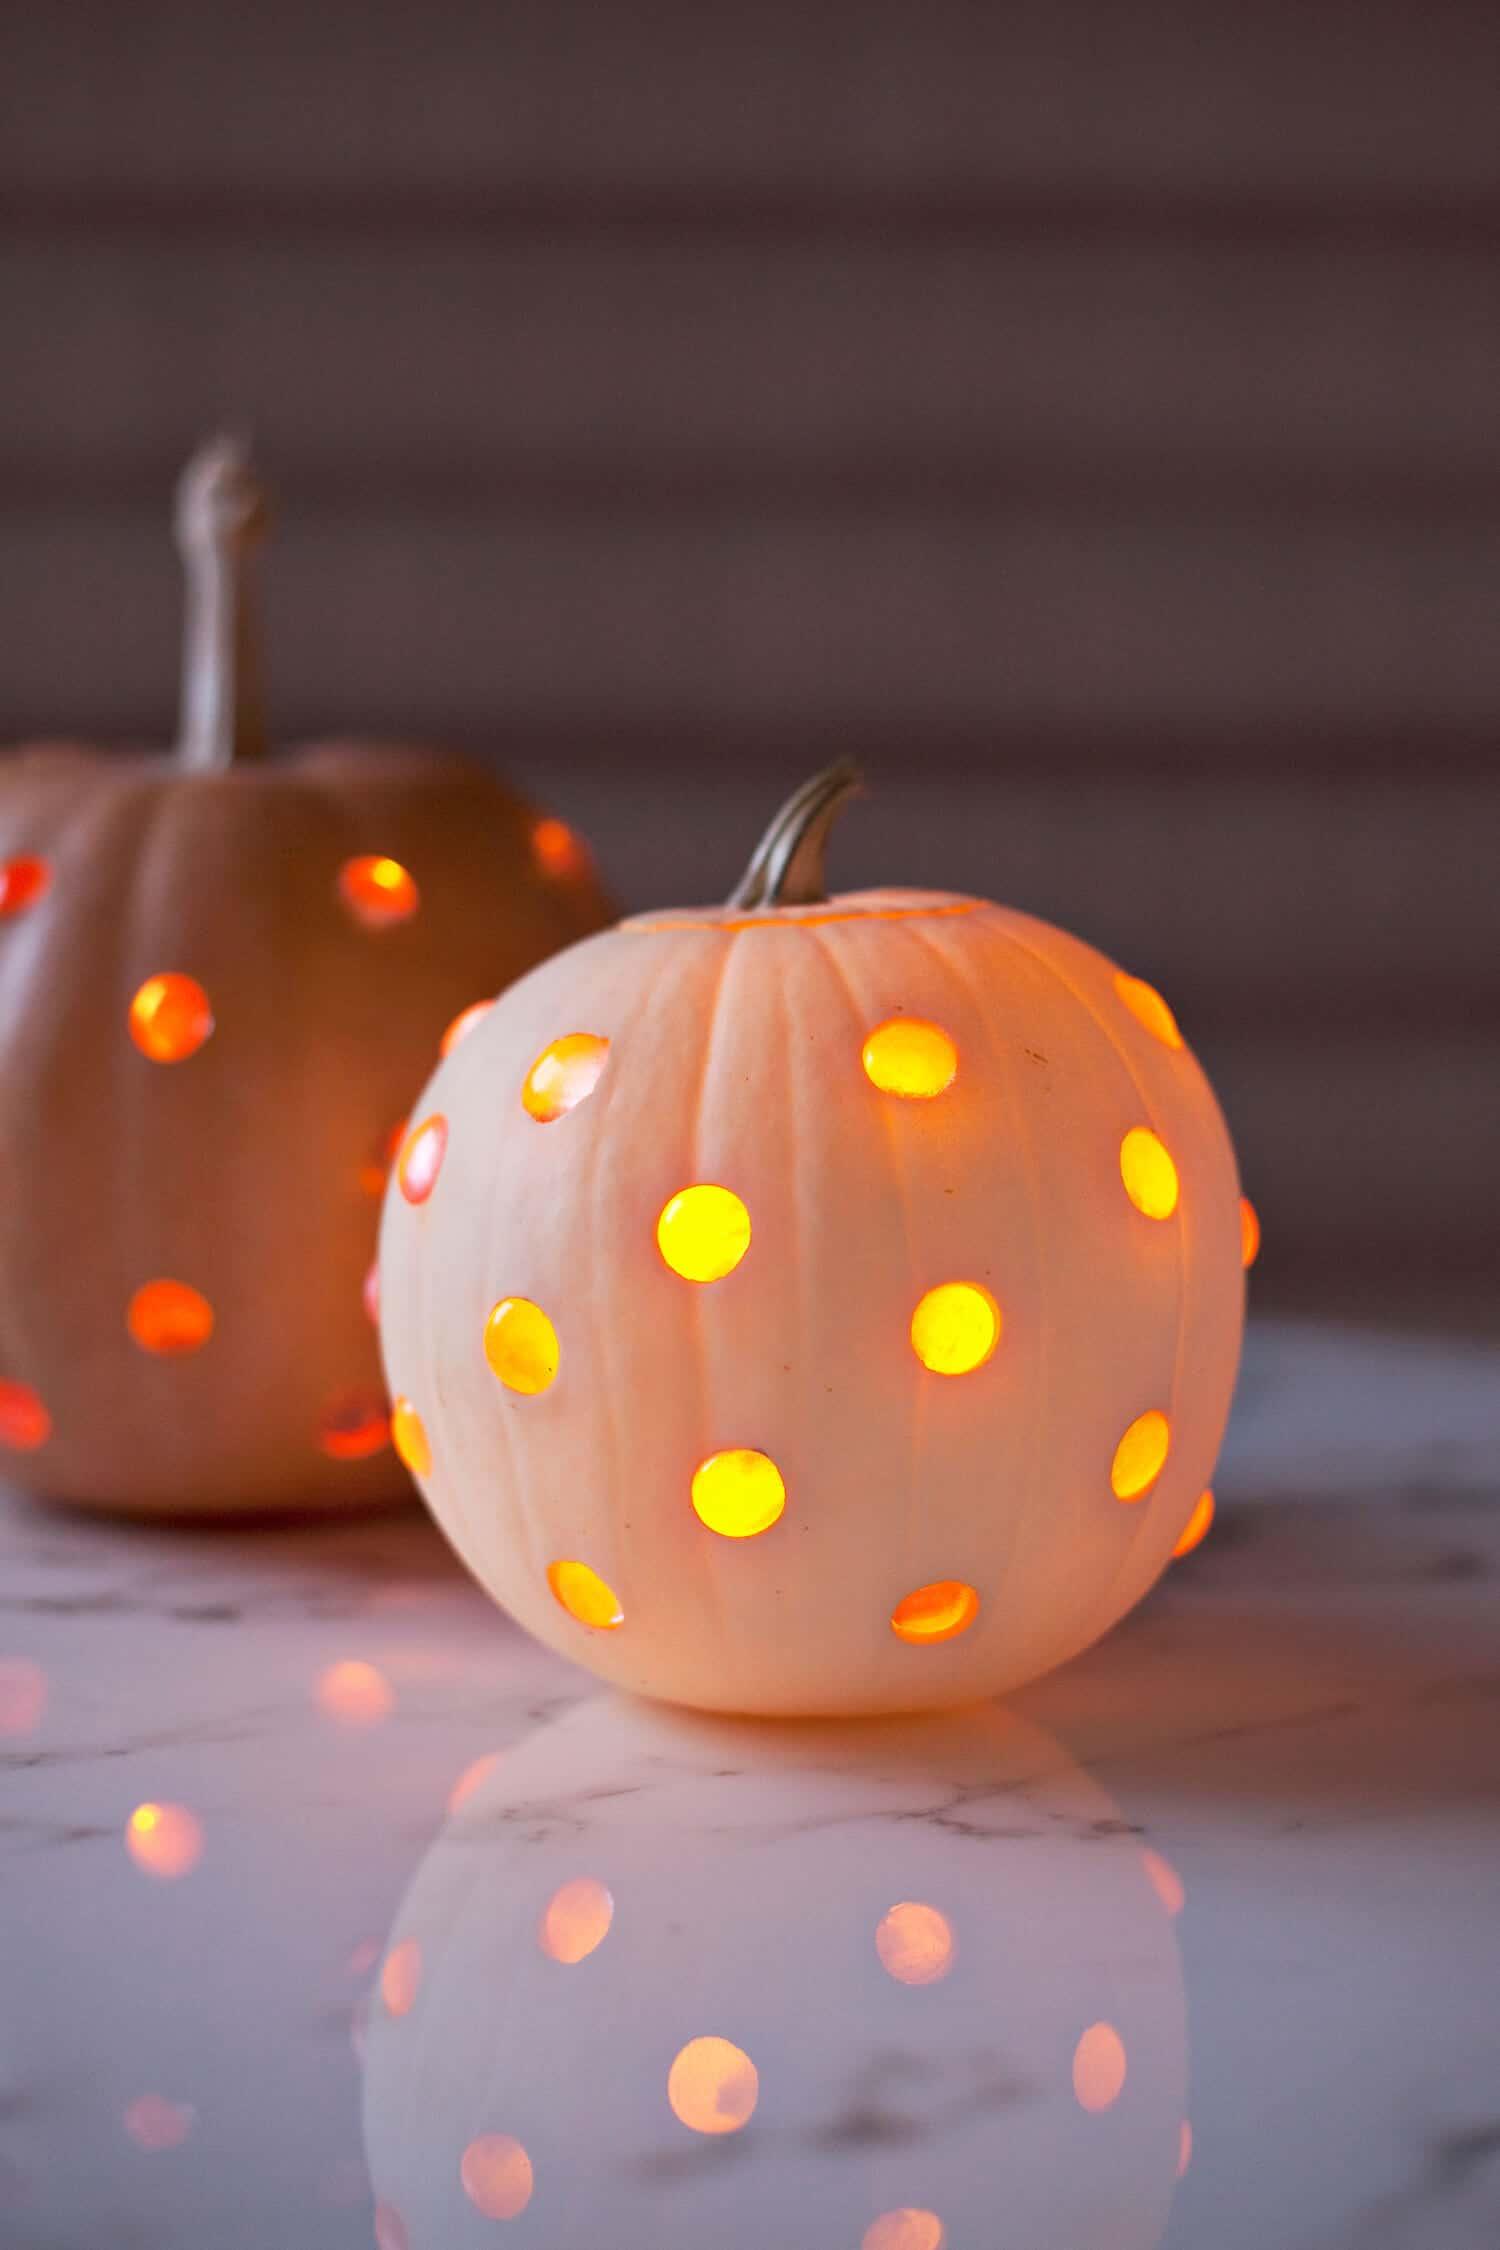 Pumpkin Carving for Halloween